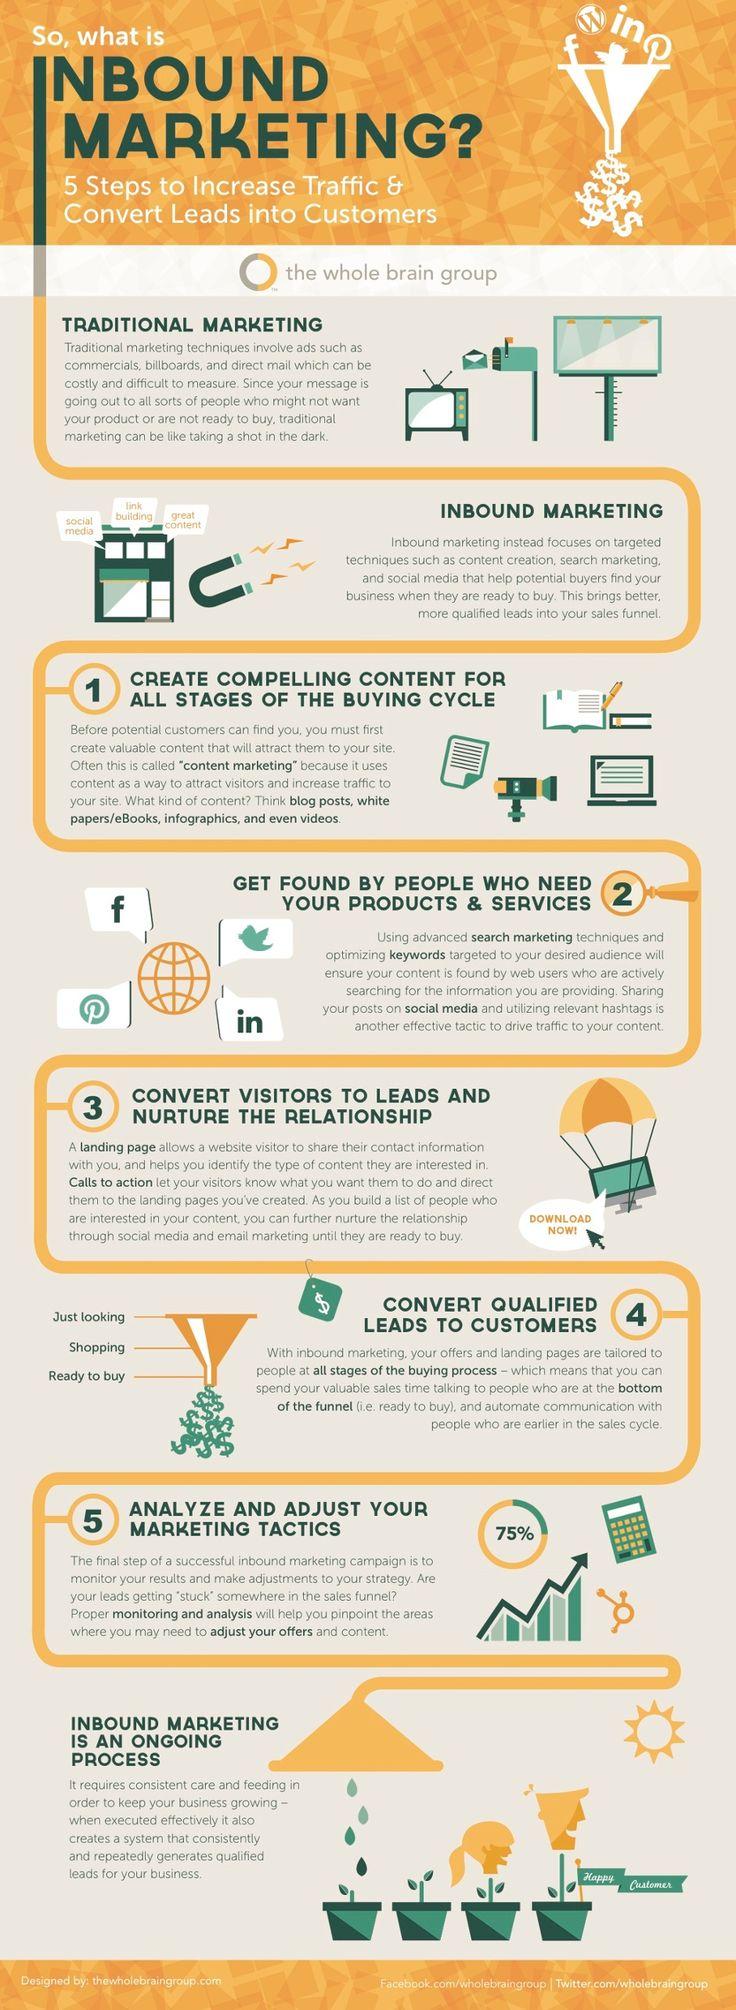 https://social-media-strategy-template.blogspot.com/ WBG_Infographic_What_Is_Inbound_Marketing.jpg